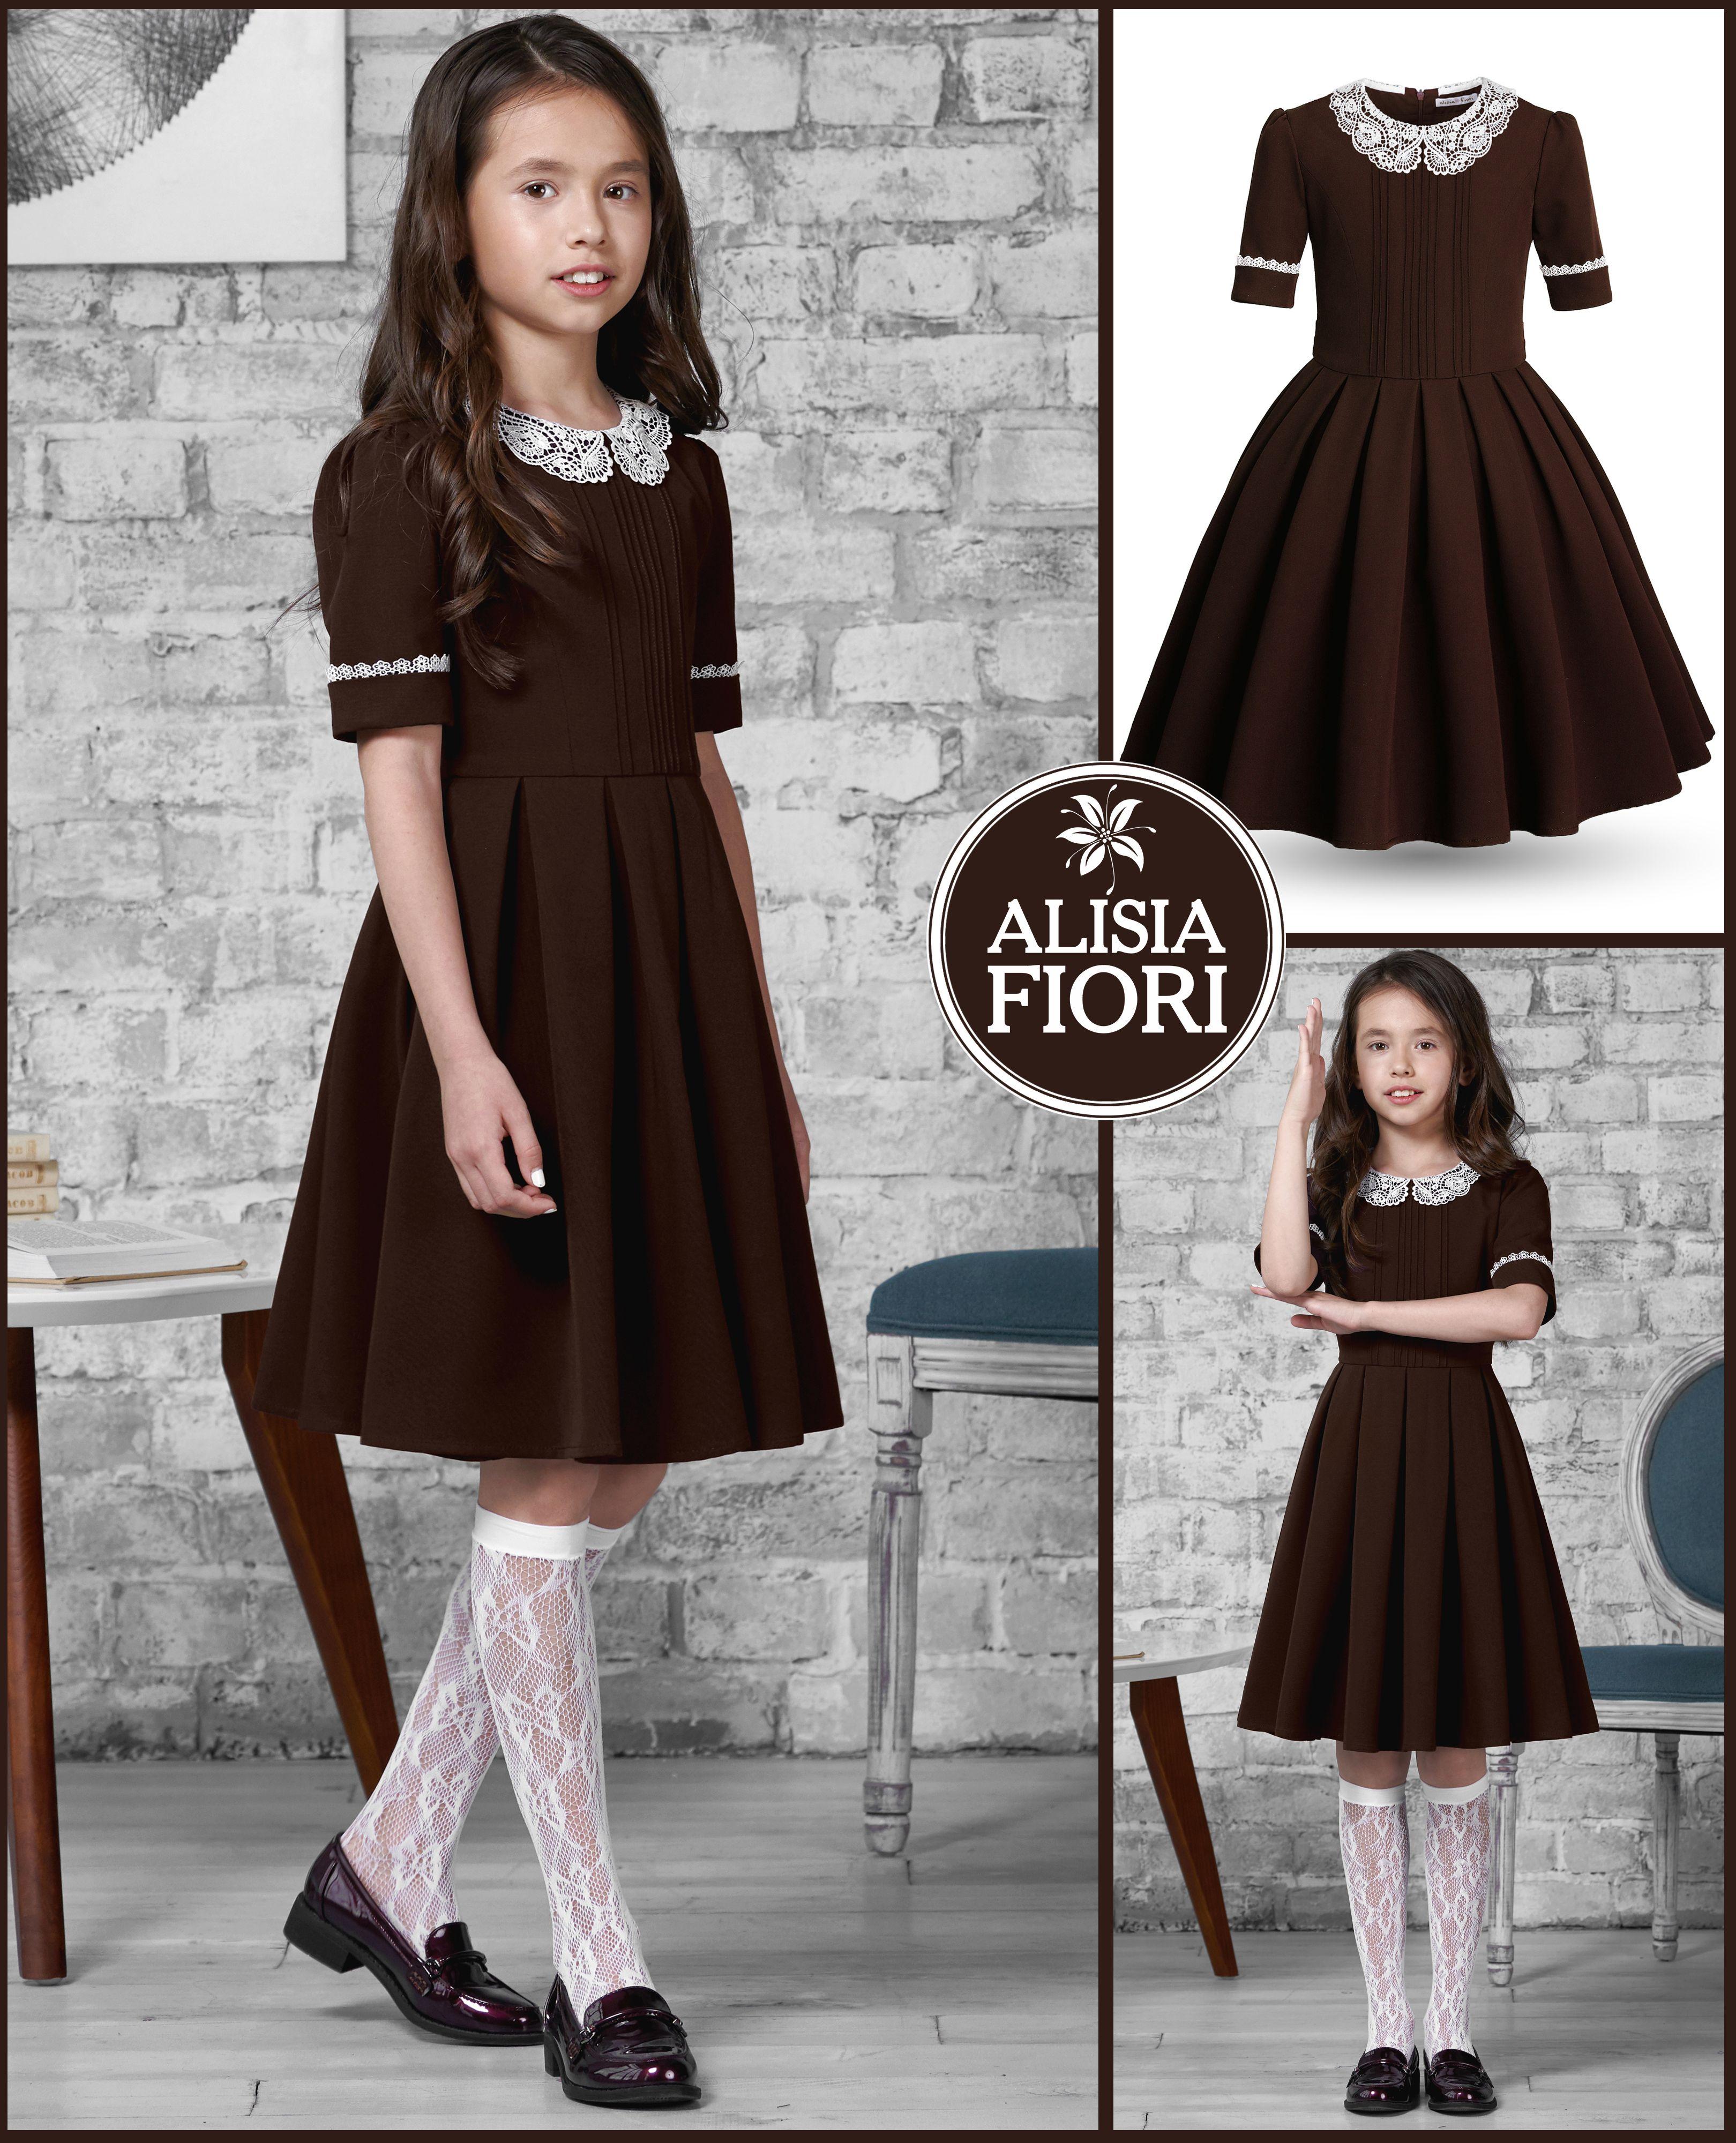 alisia fiori | dresses for teens, dresses, girl fashion